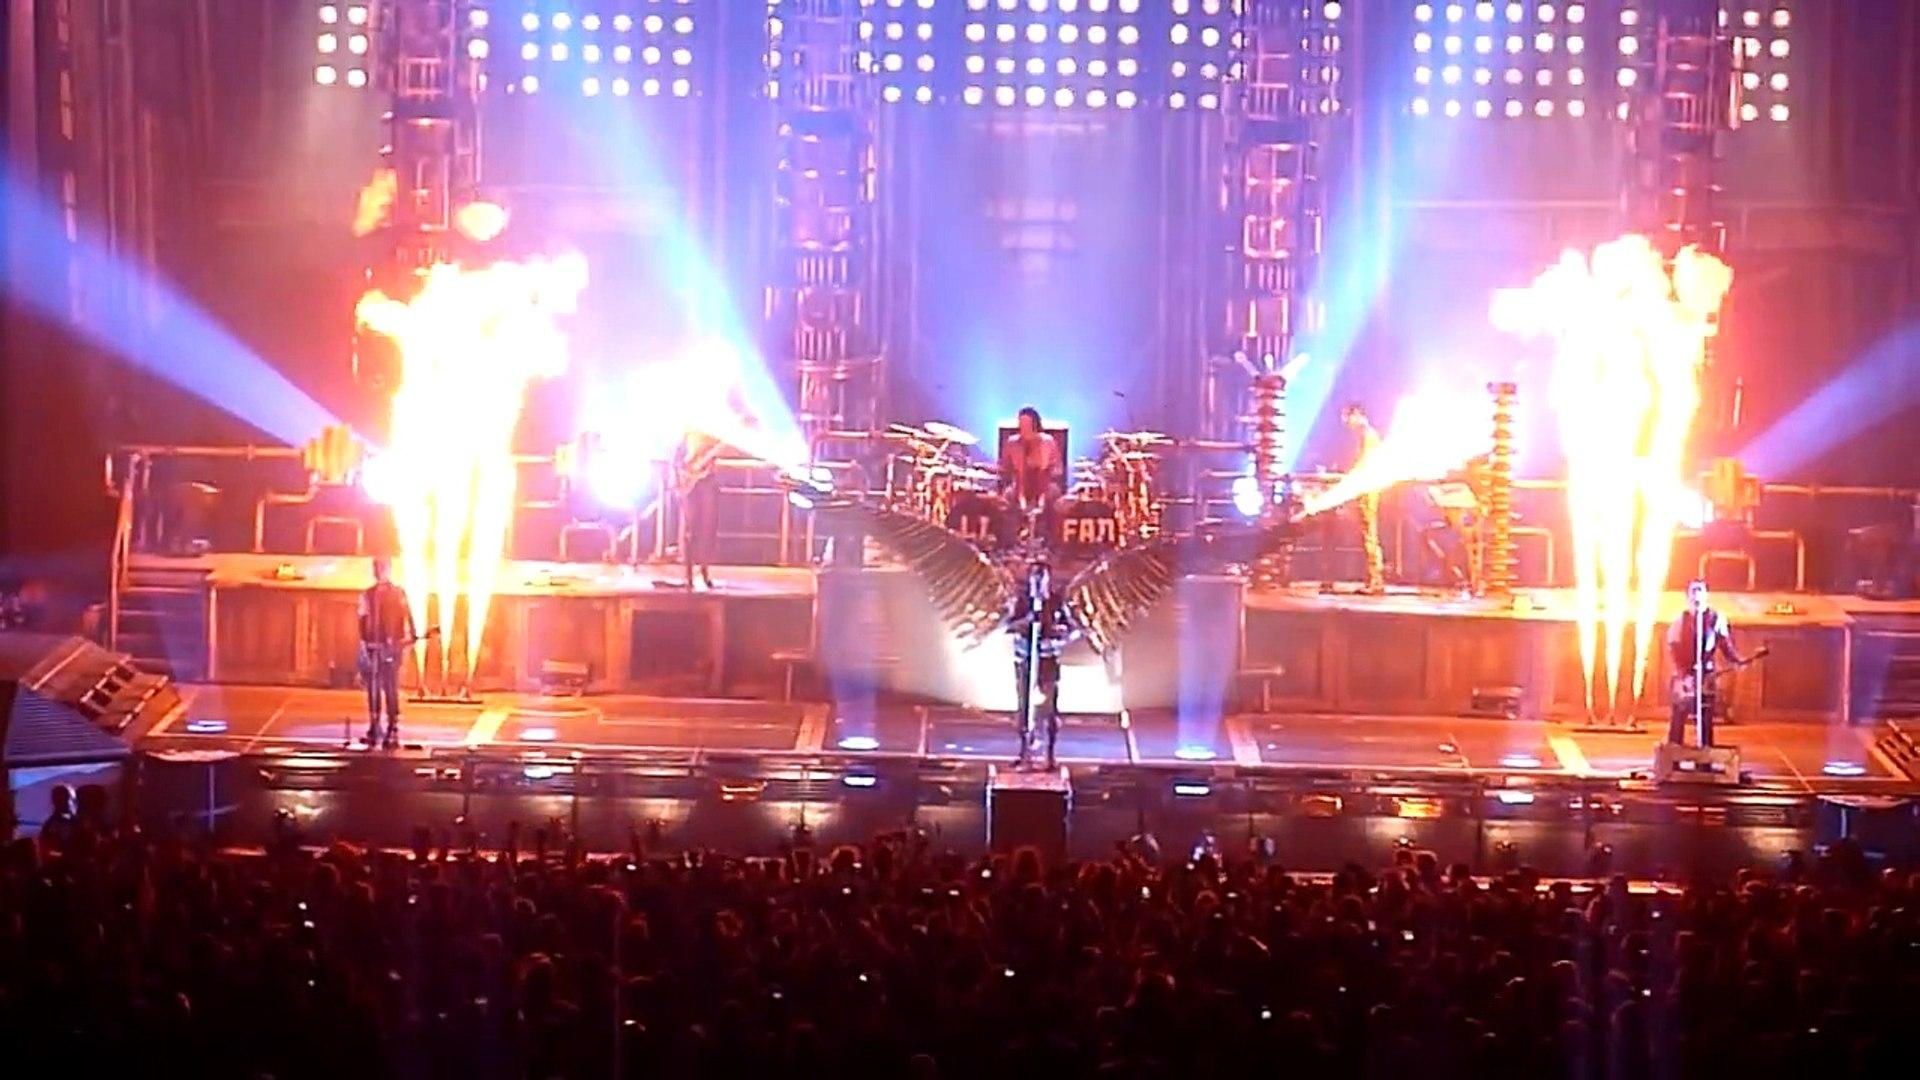 Rammstein Live In New York December 11 2010 Engel